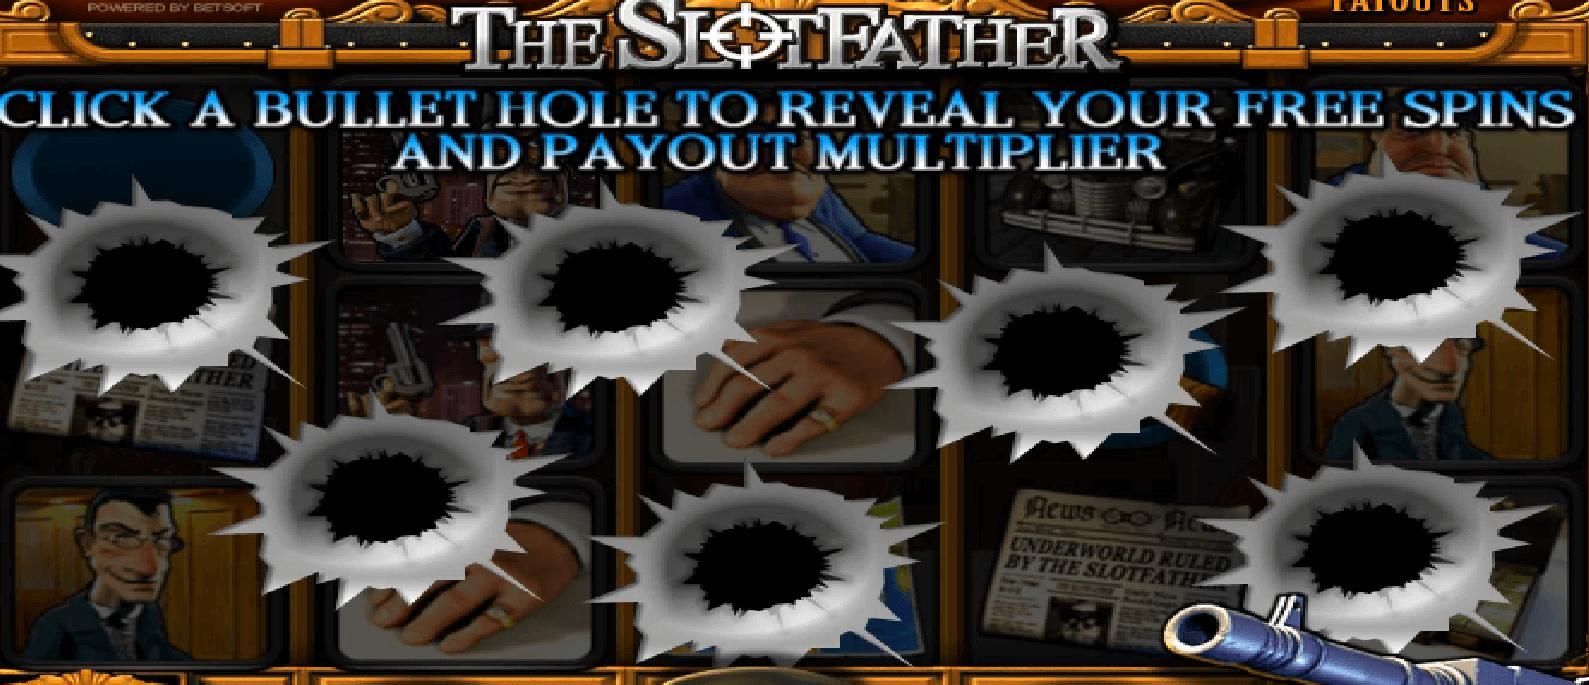 The slotfather slot game